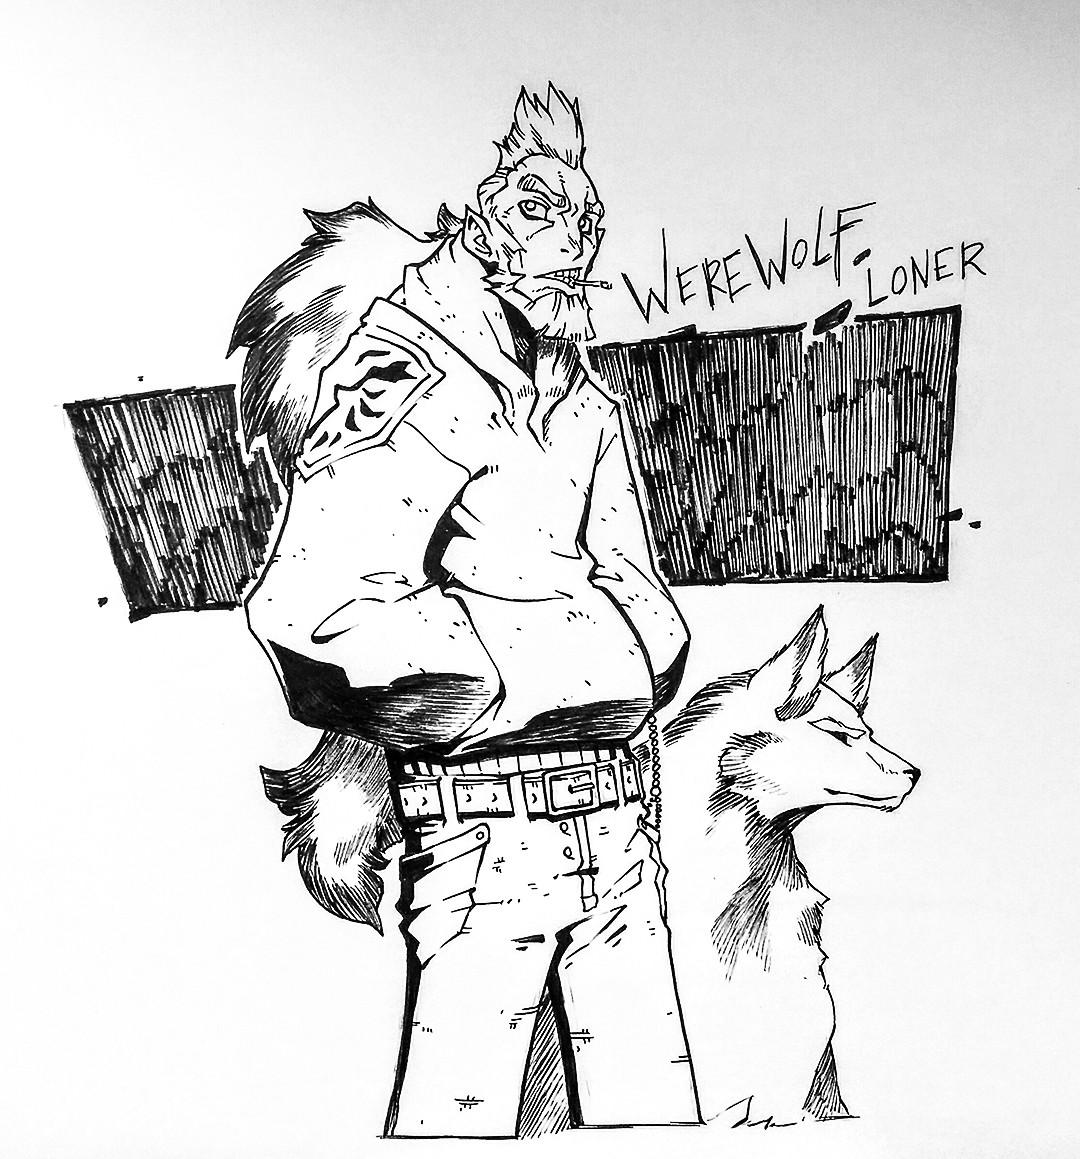 Jerome brulin 171008 werewolfloner ld